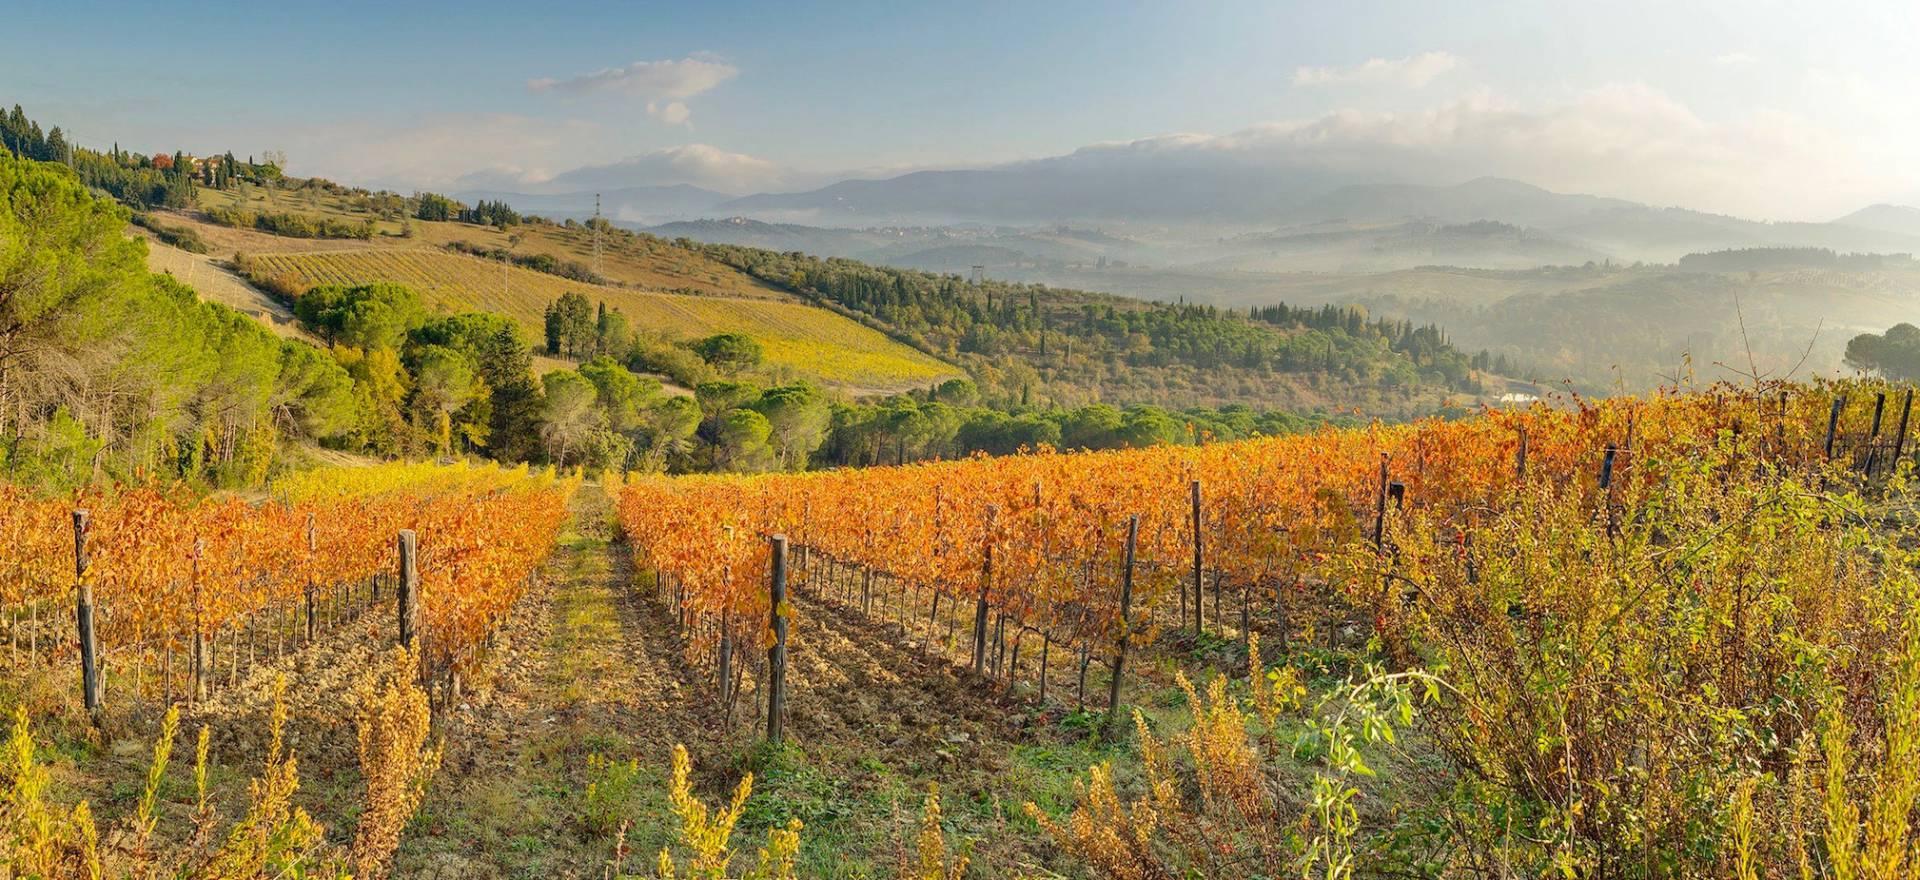 Agriturismo Toscane Agriturismo in Toscane tussen de wijngaarden bij Florence